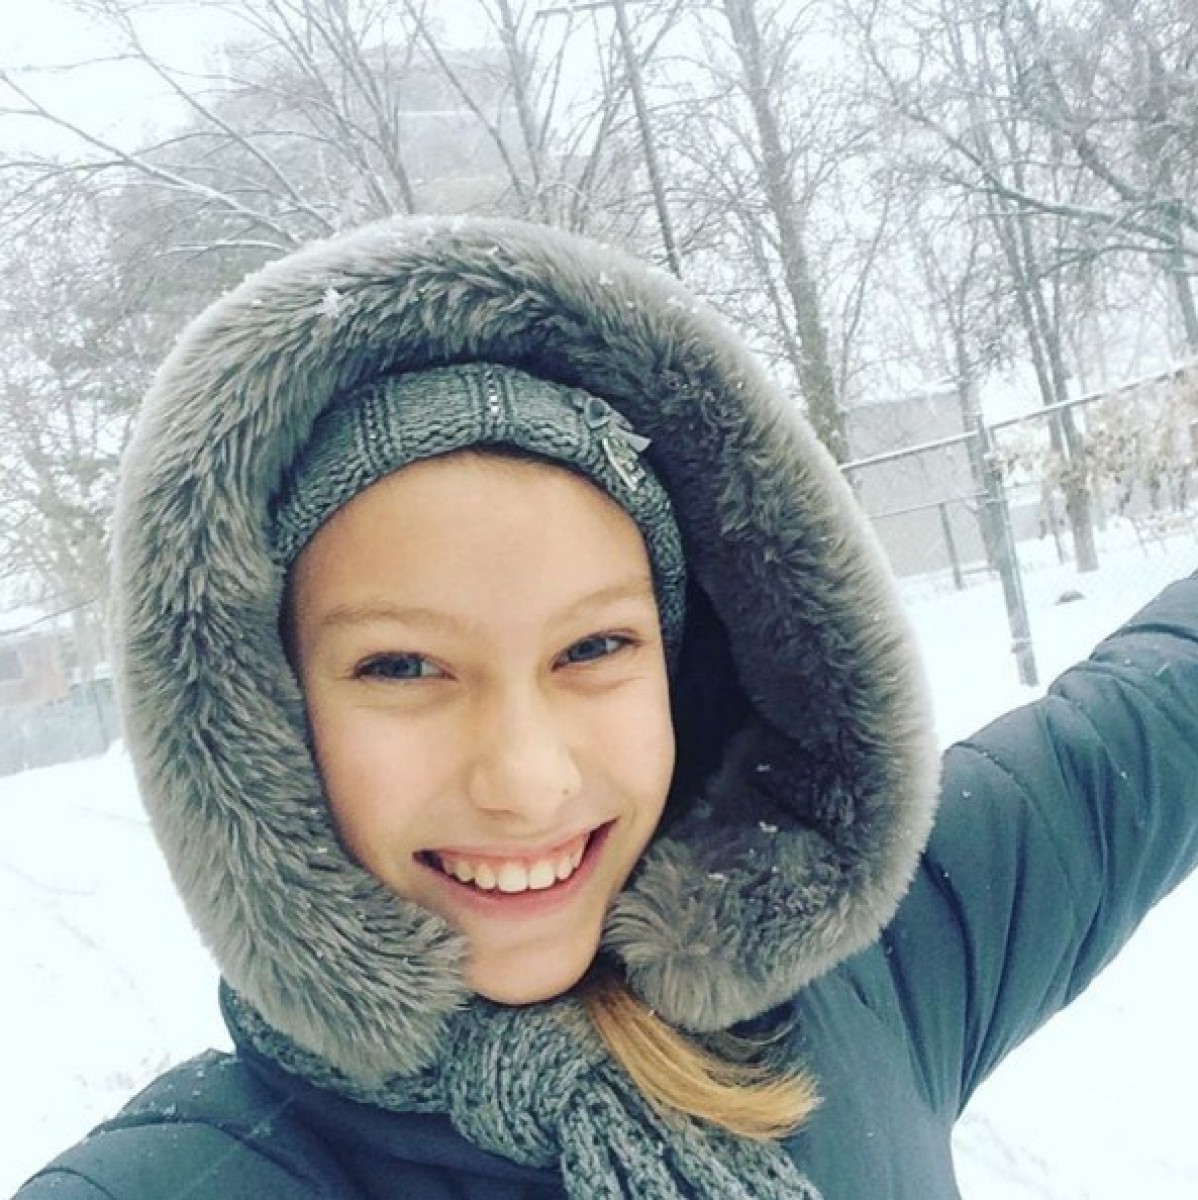 7a320d491207325d5b32088f5eabb518 Зимняя Одесса: пес-снеговик, одинокий Дюк и машины в сугробах